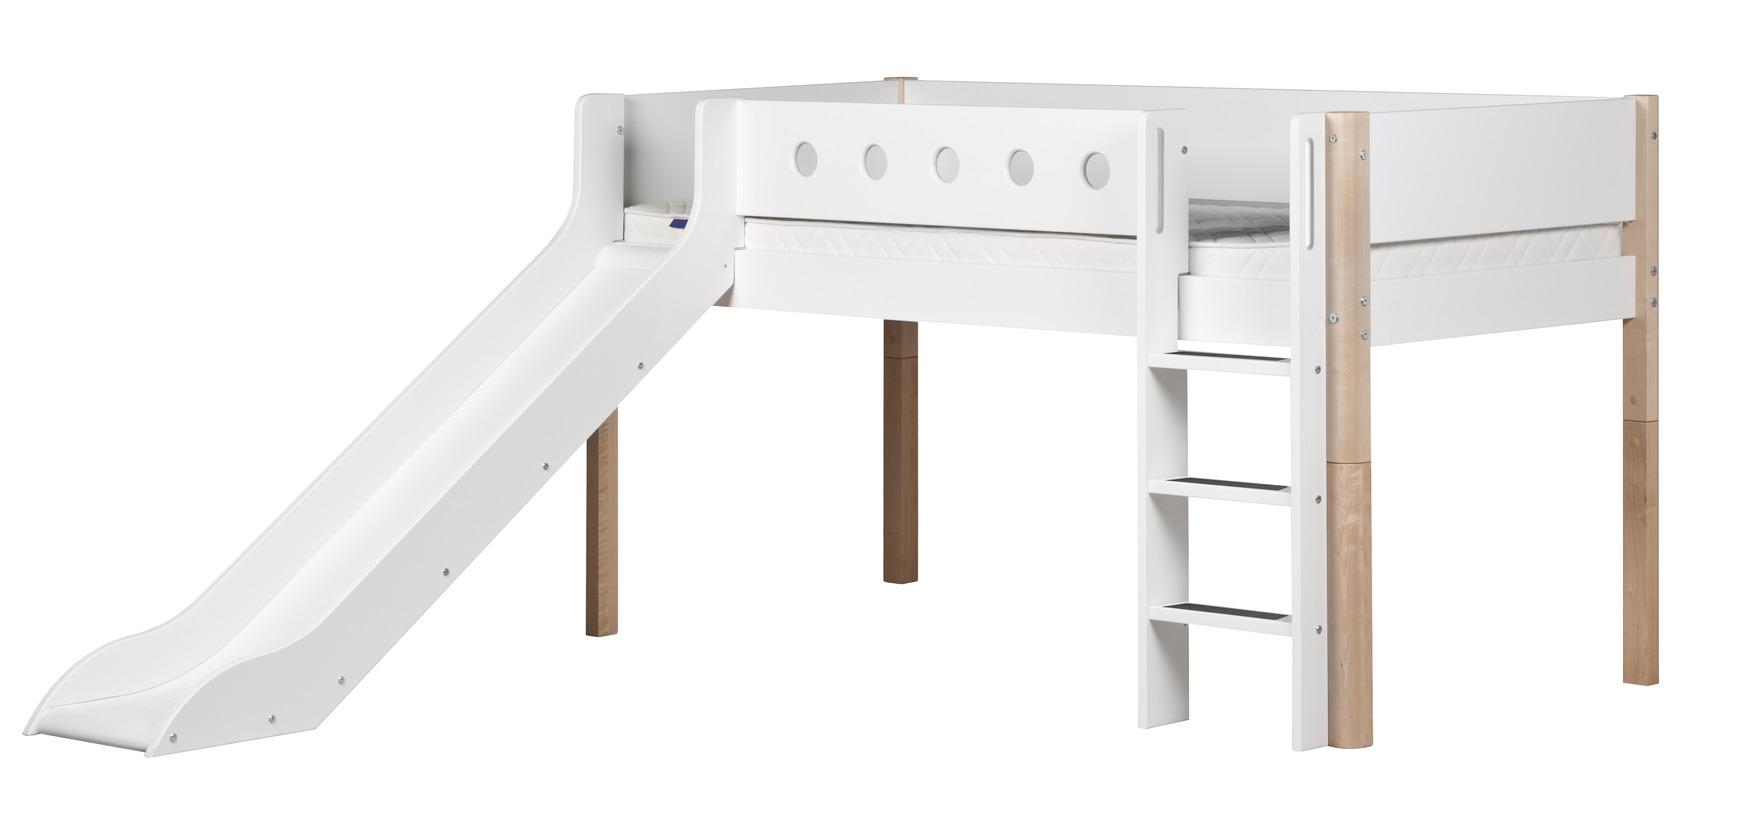 flexa halbhohes bett mit rutsche 90 x 200 cm h he 120cm. Black Bedroom Furniture Sets. Home Design Ideas